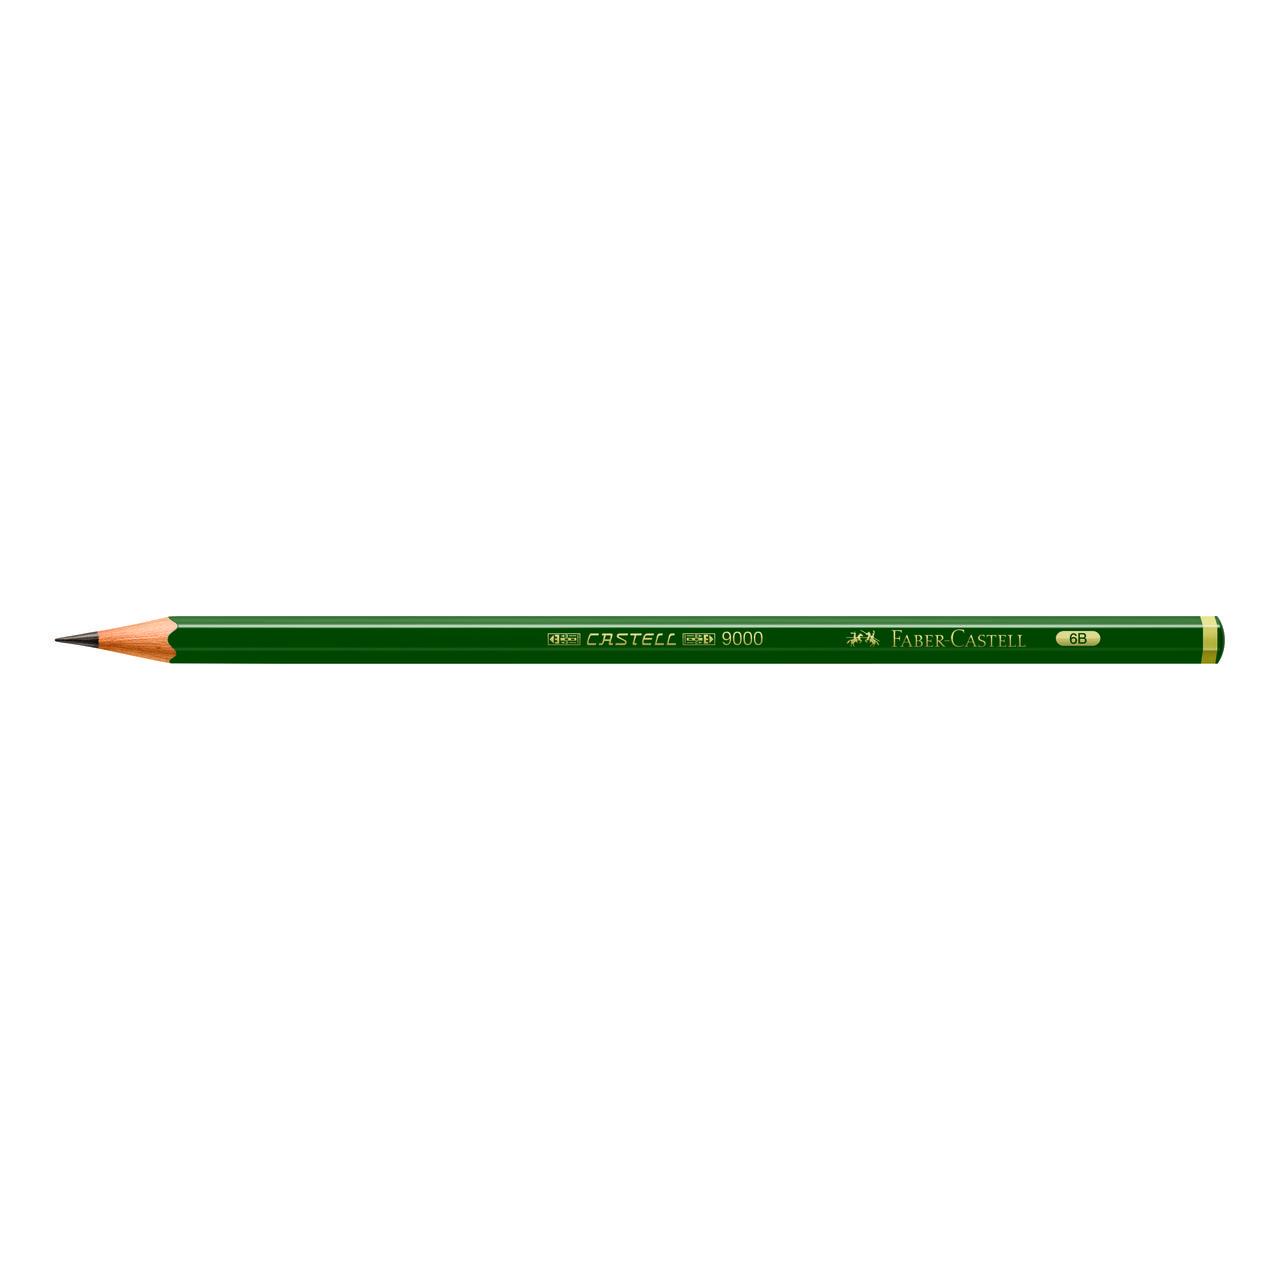 Lápis técnico 6B 9000 Faber-Castell